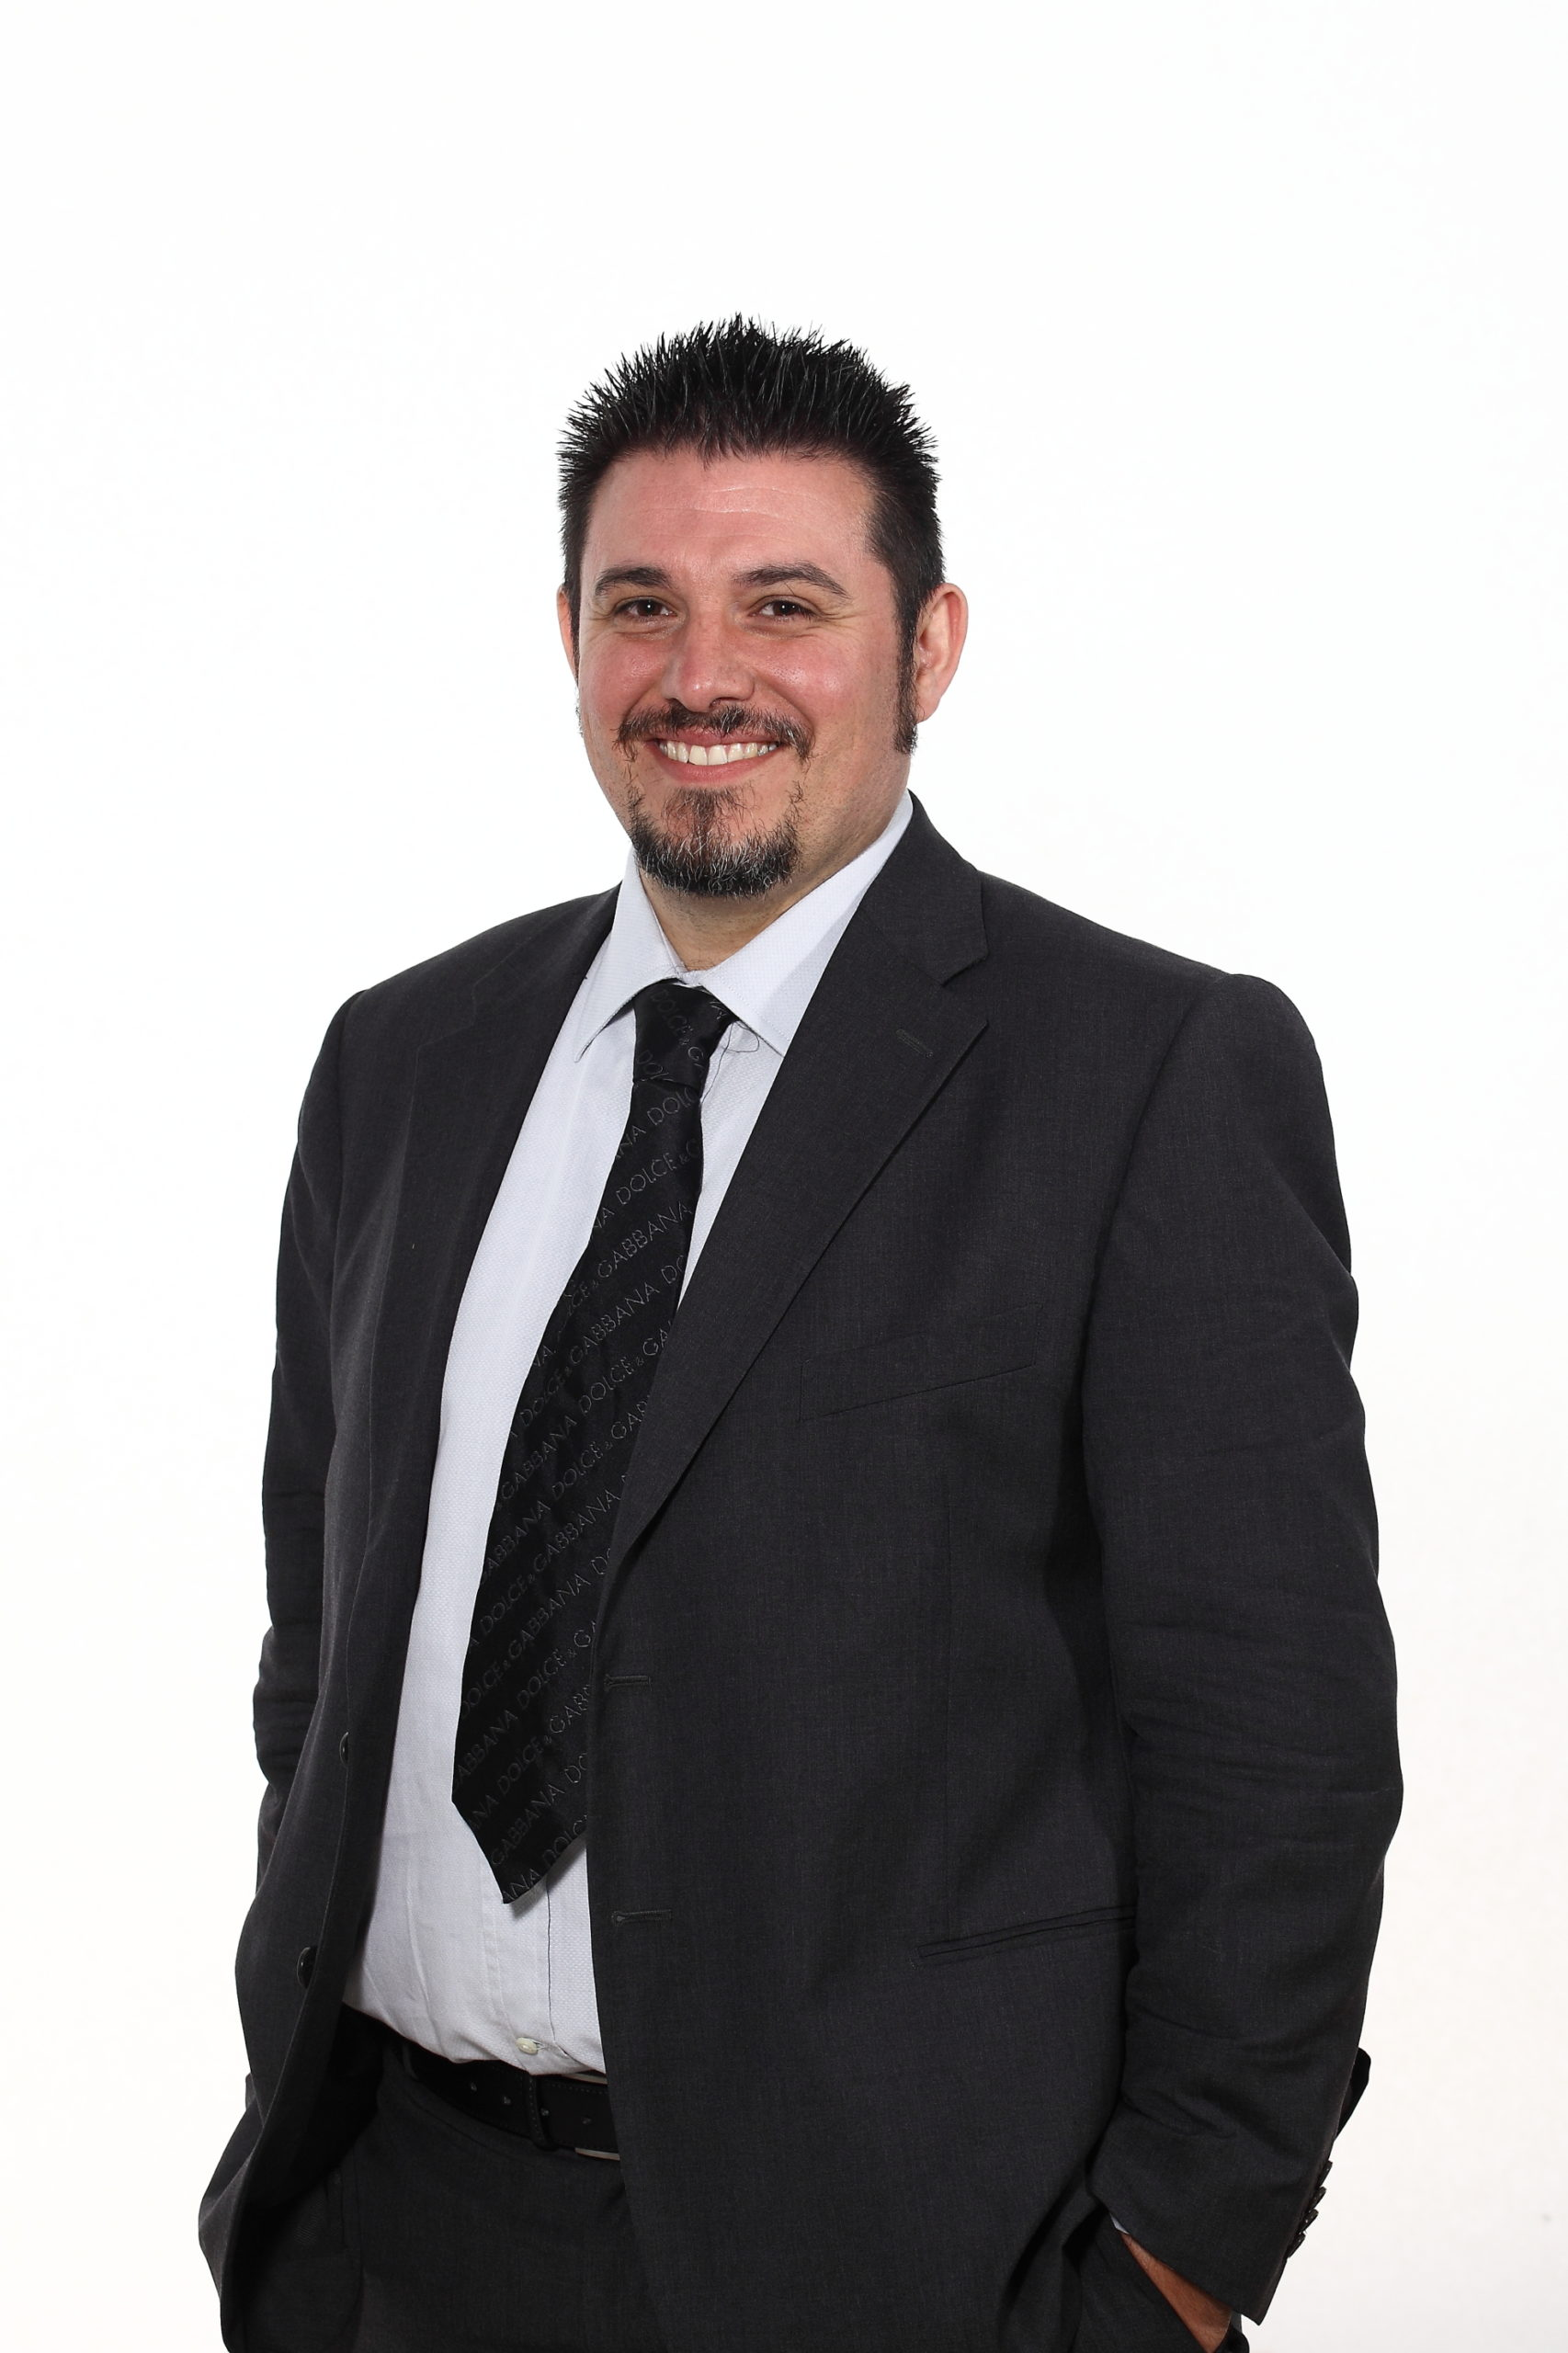 Daniel Bertinelli